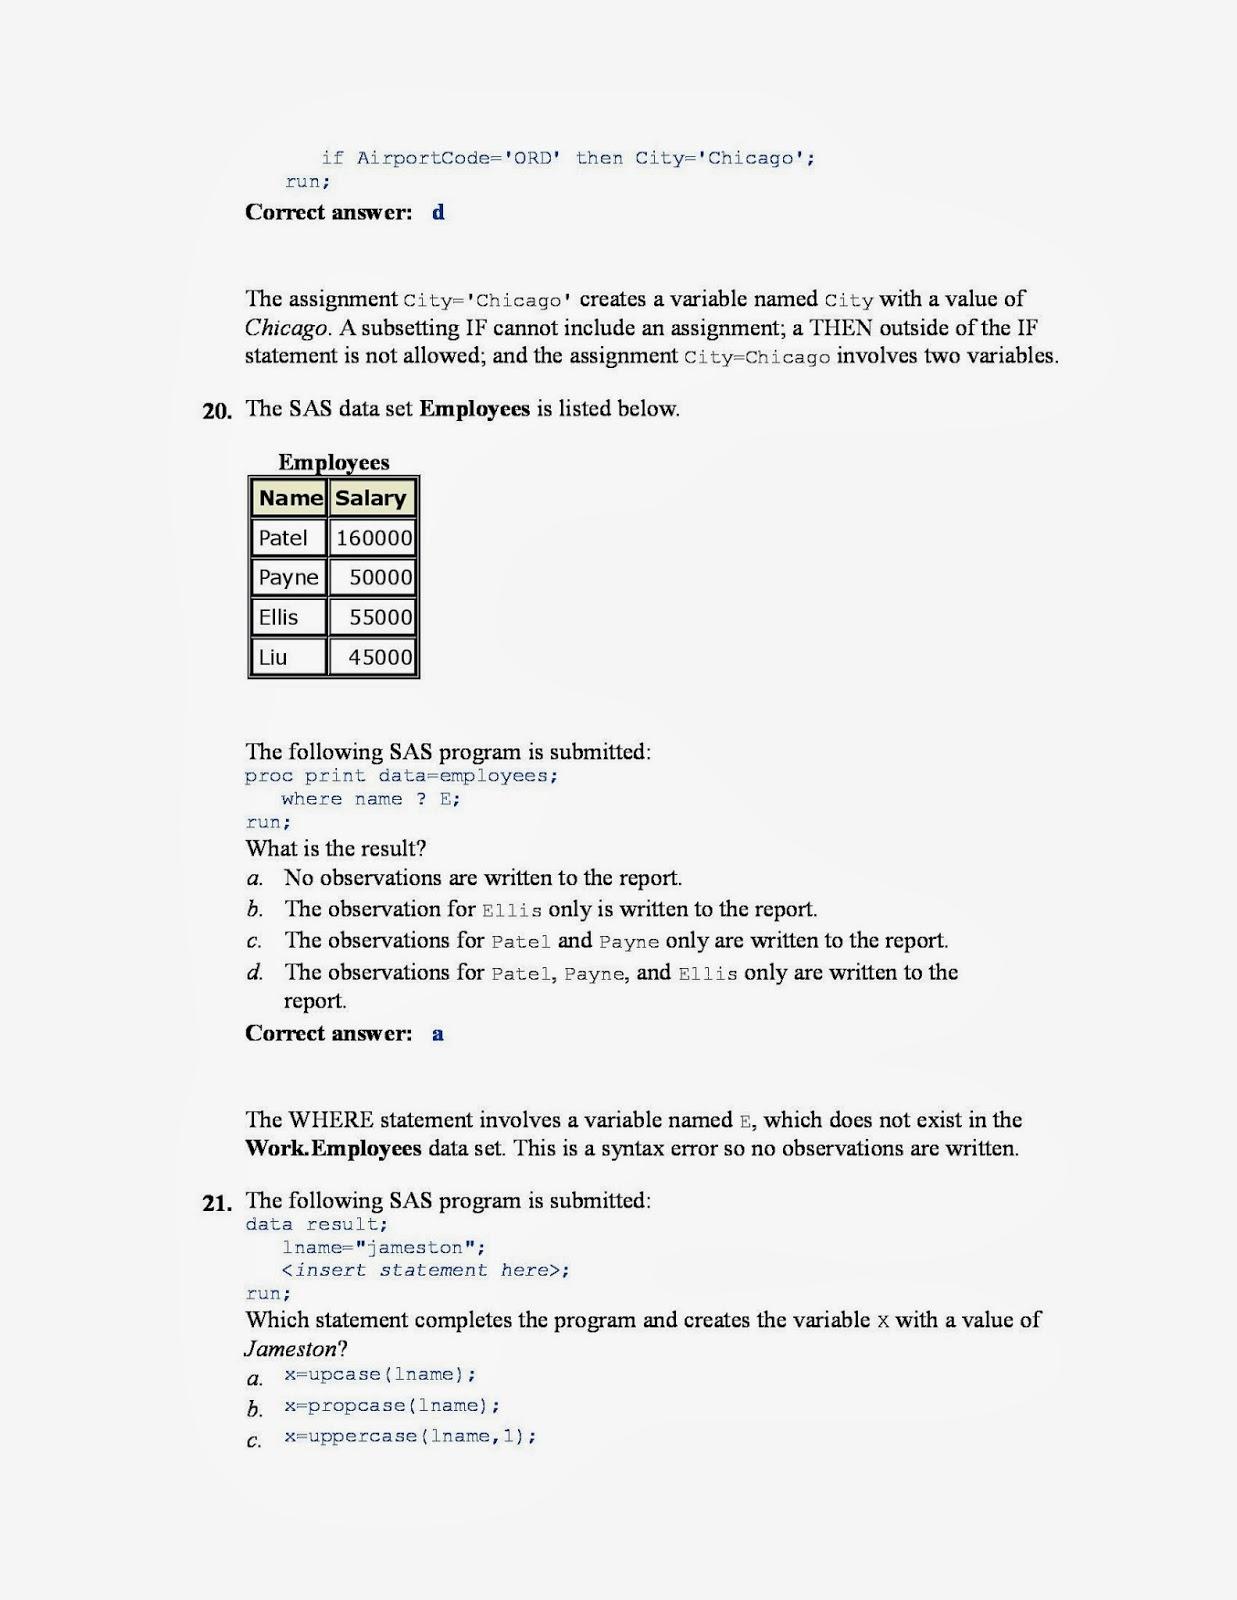 sas base certification questions sample